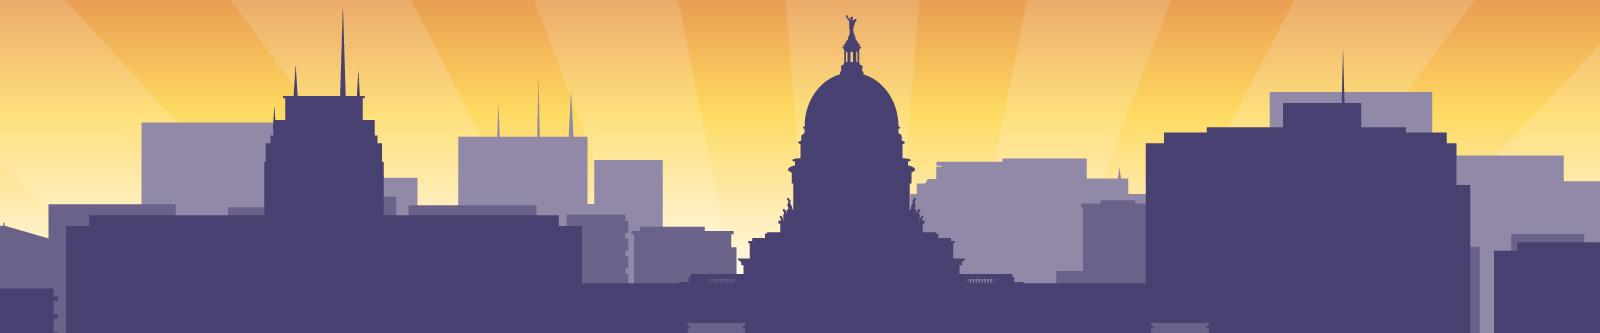 Illustration of Madison skyline